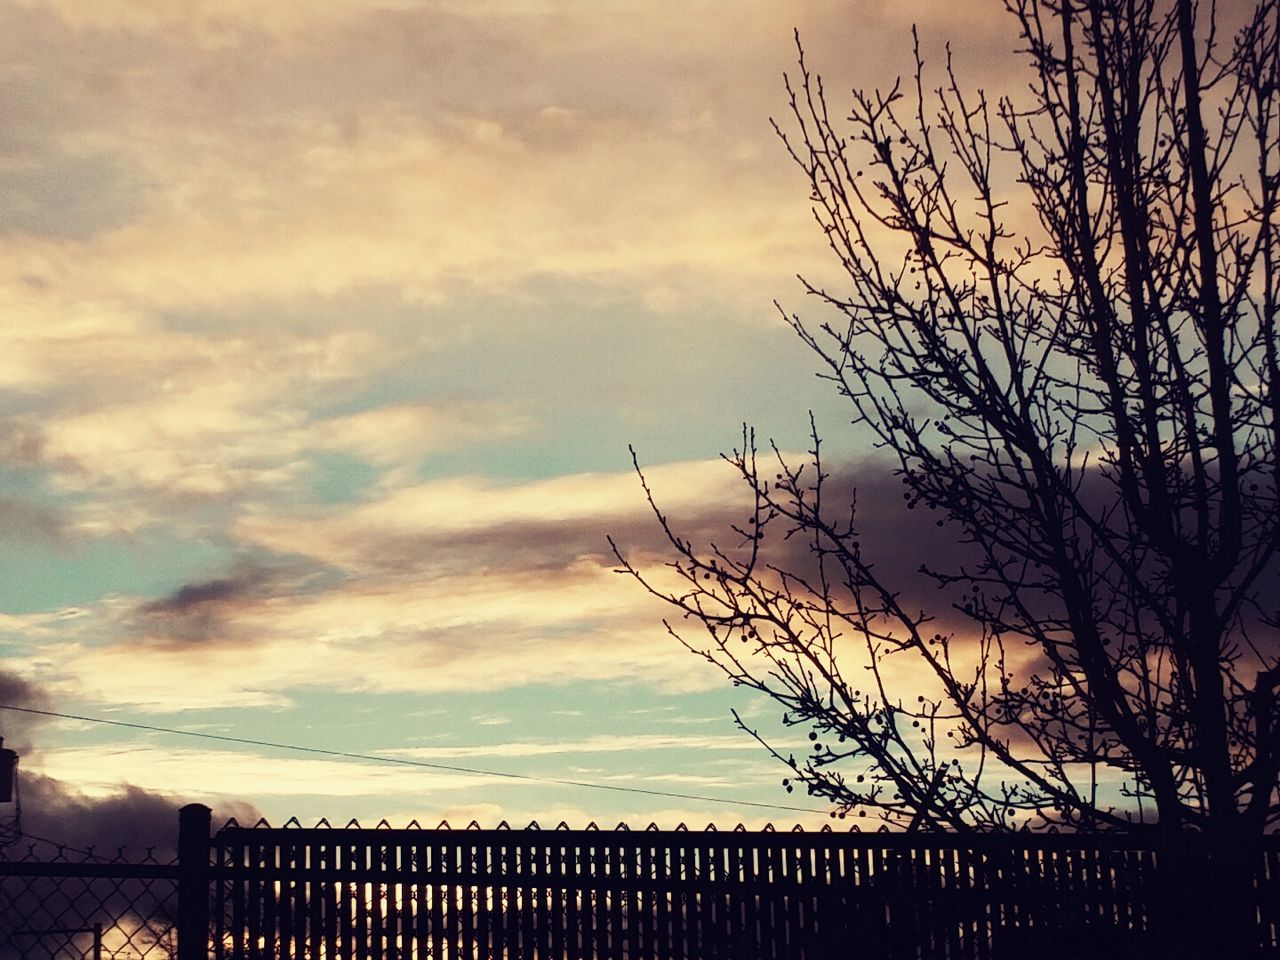 AtMcDonalds Onadrive Fence Trees Landlines